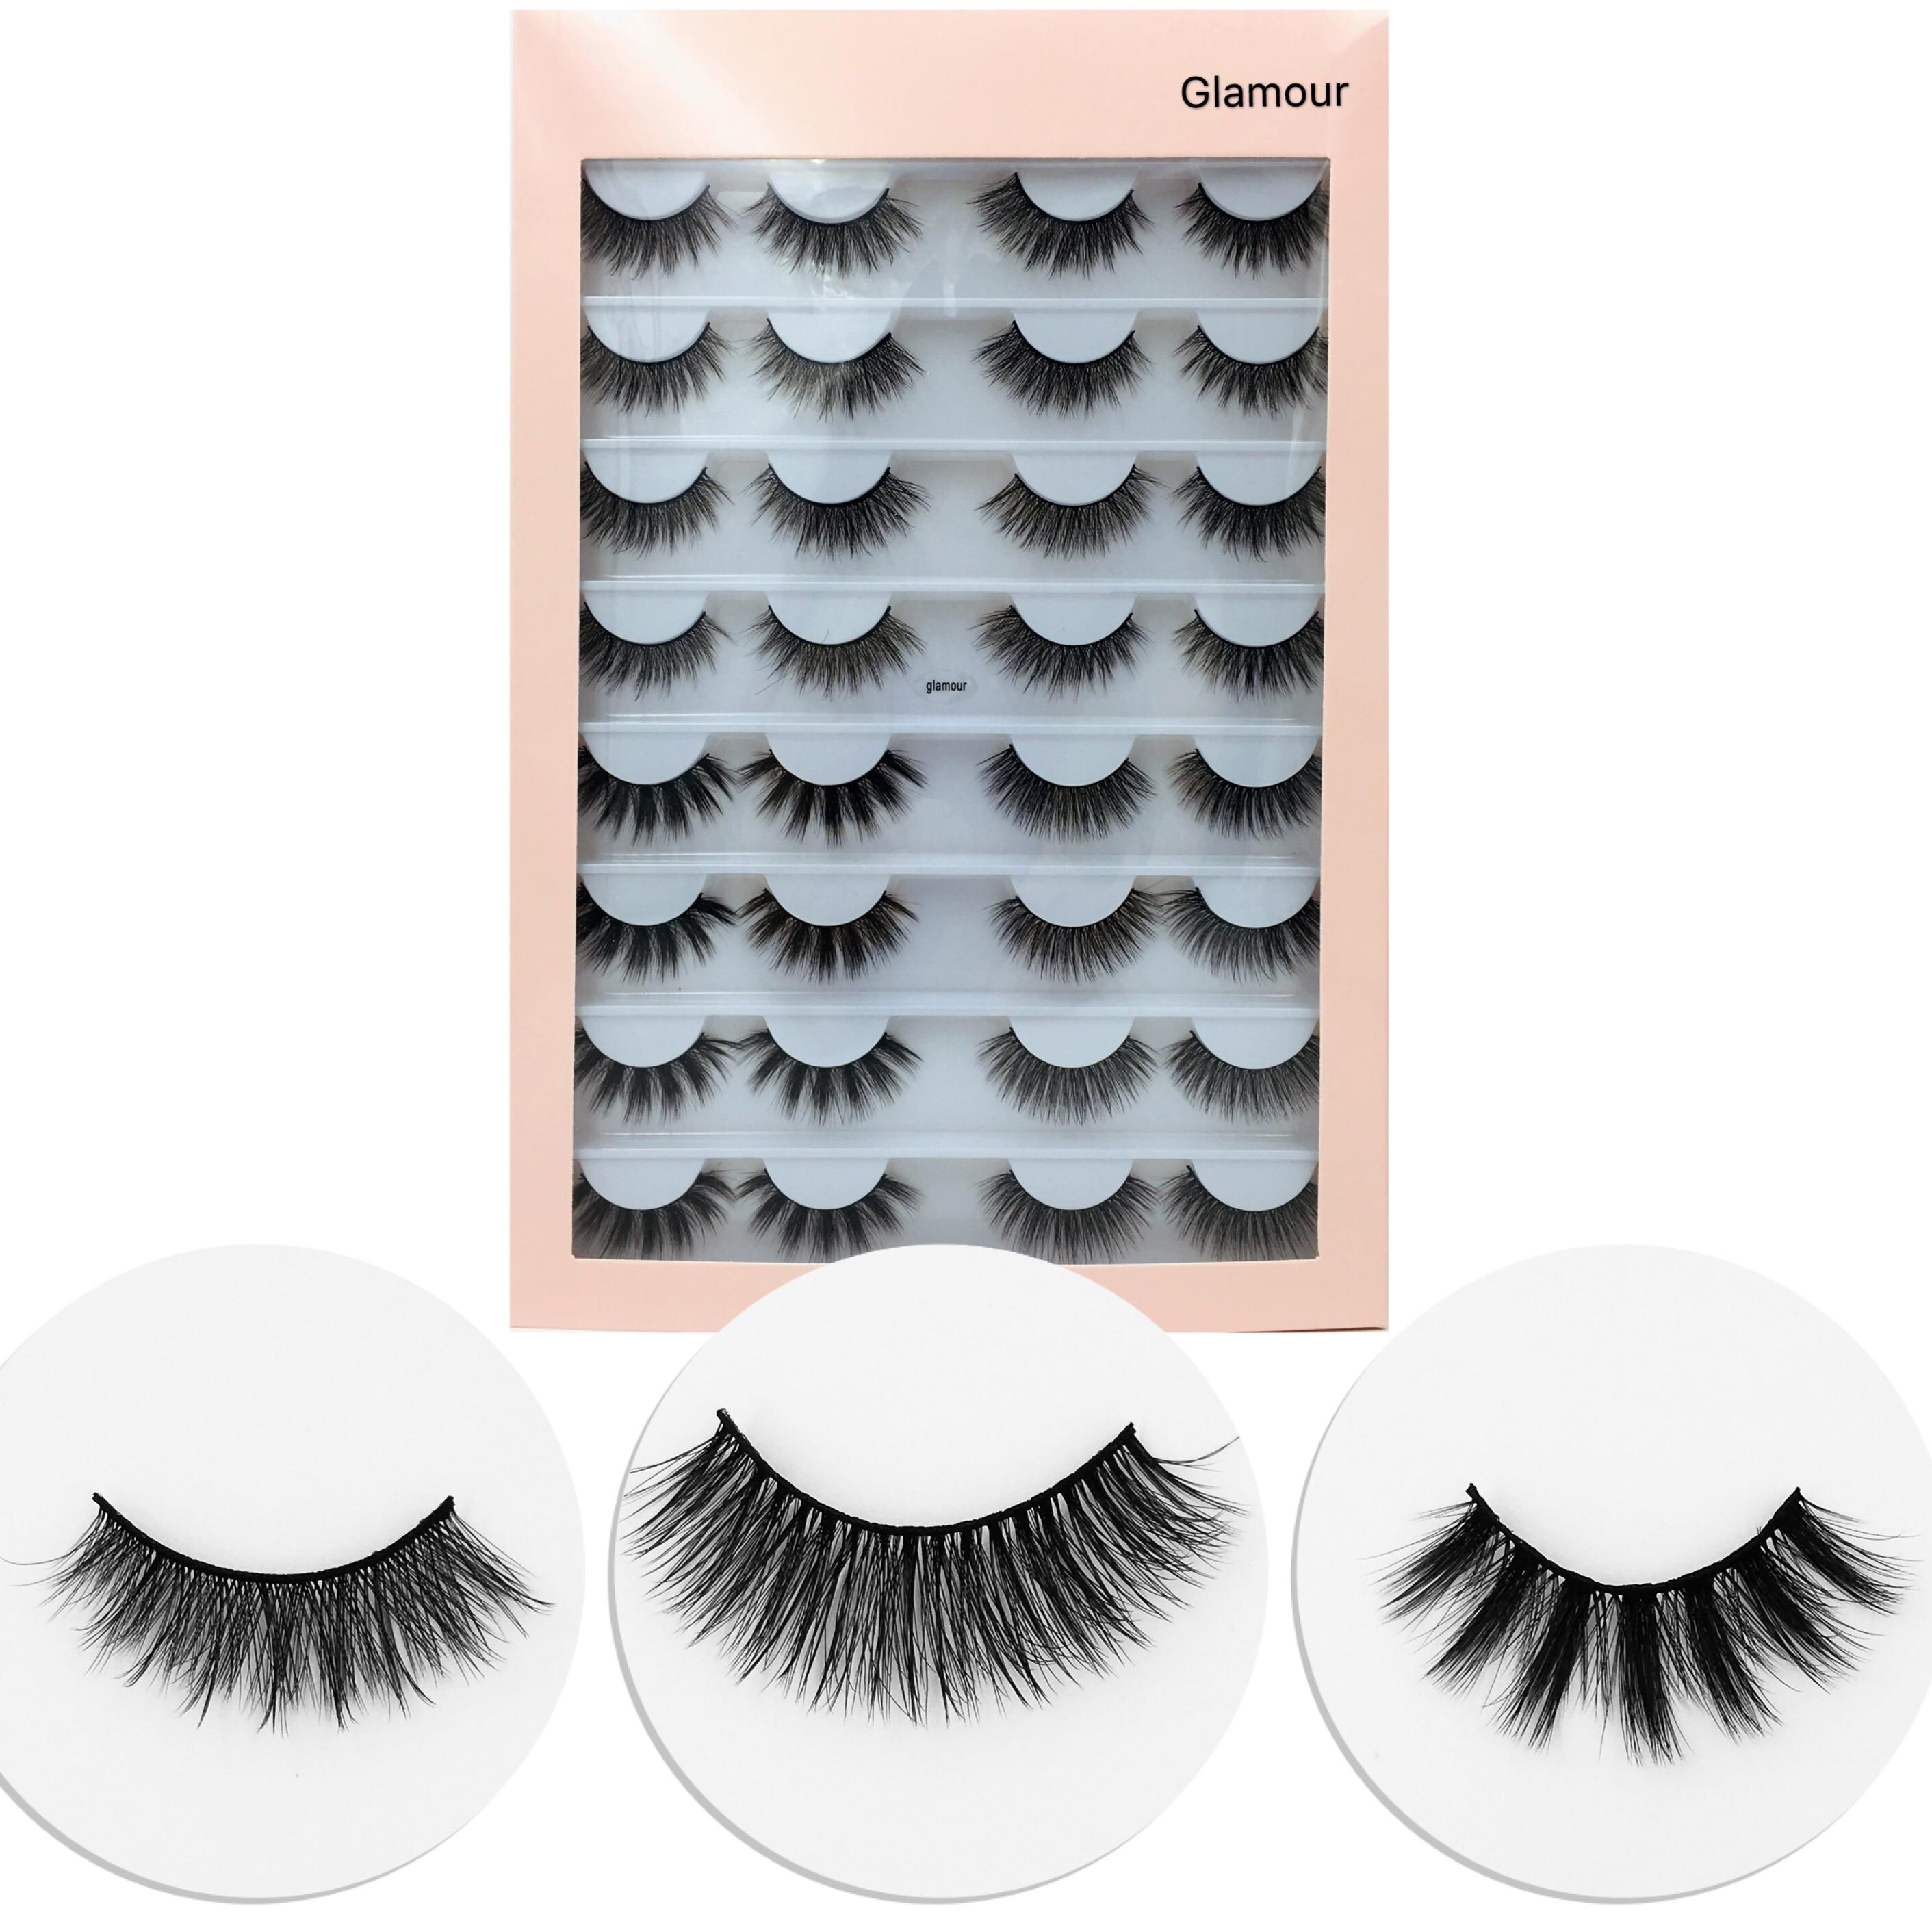 Nuevos 16 pares 3D pelo de visón suave natural pestañas postizas hechas a mano esponjosas pestañas largas naturales maquillaje de ojos herramientas ojo las pestañas